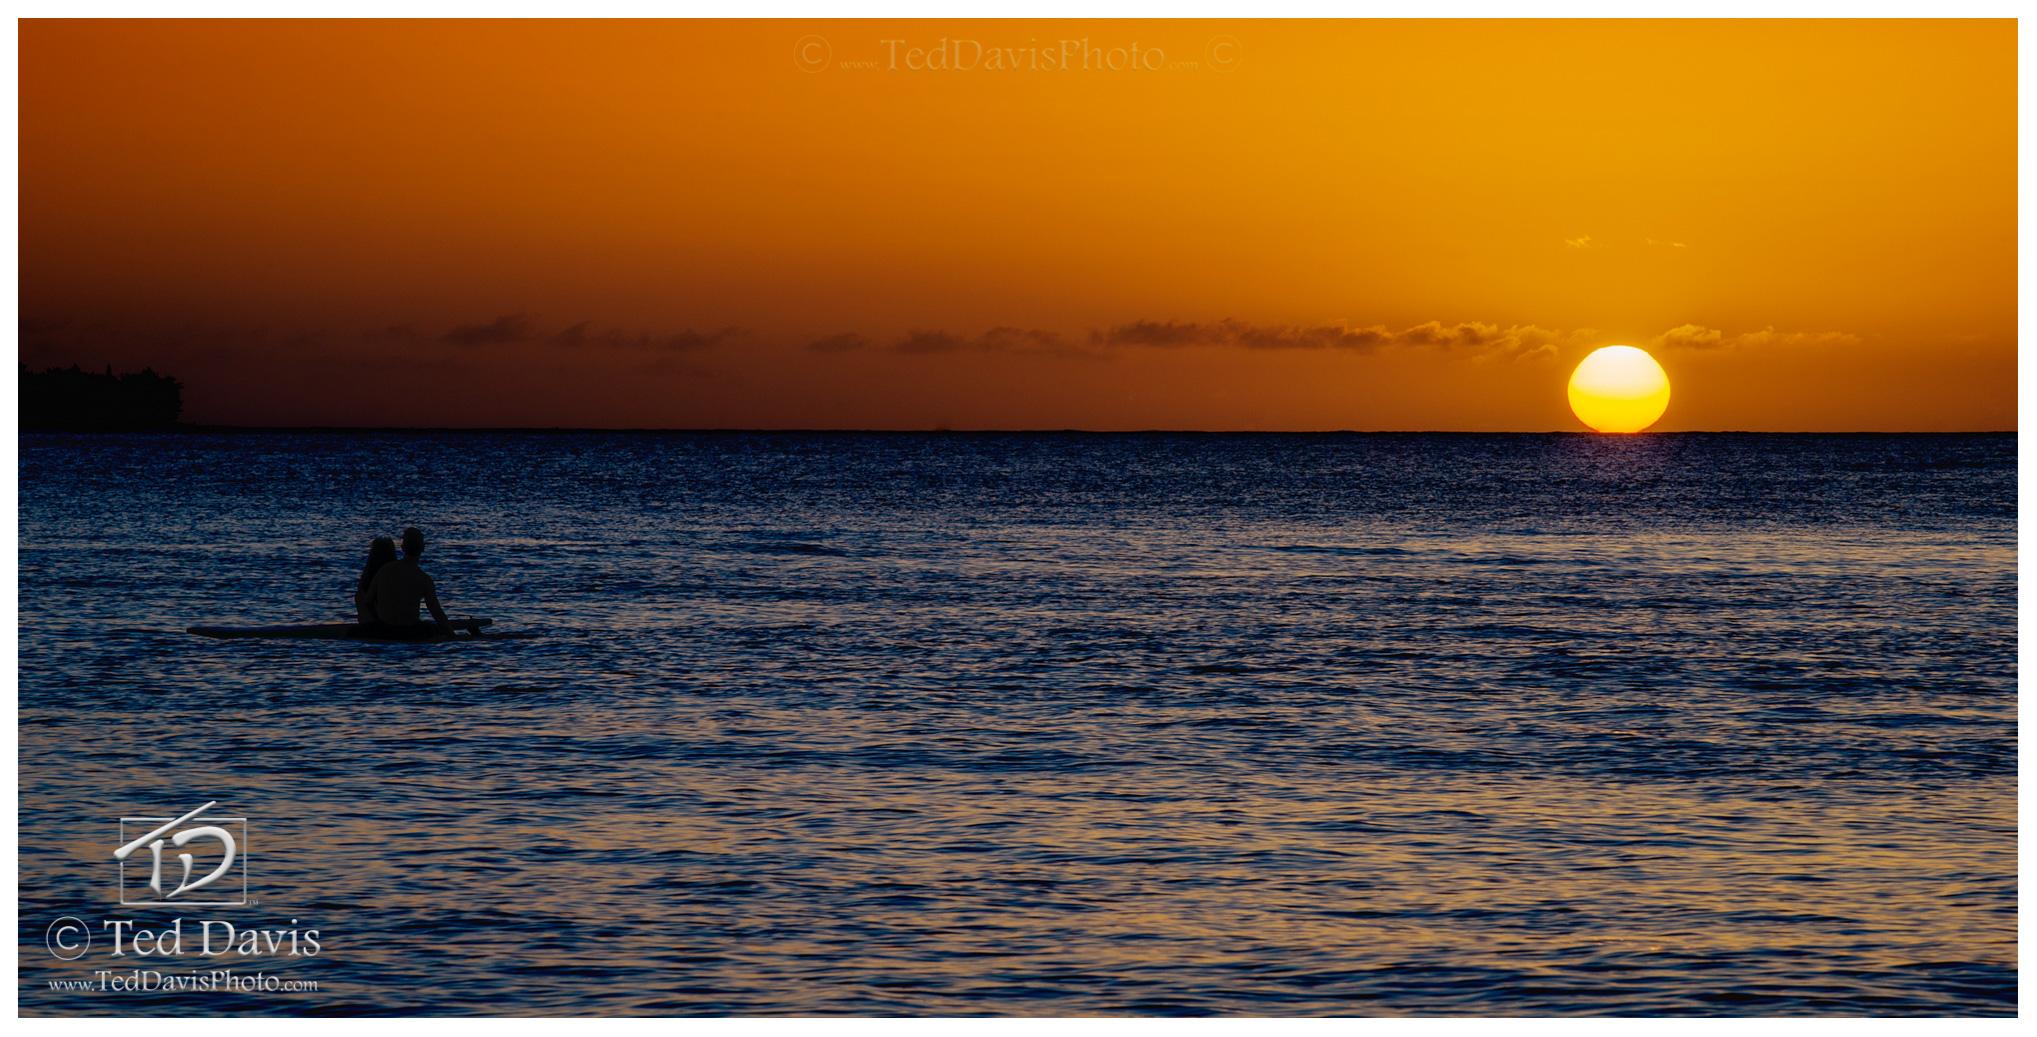 surfers, princeville, kaua, sun, setting, friday, lovers, strangers, awe, horizon, drifting, board, photo